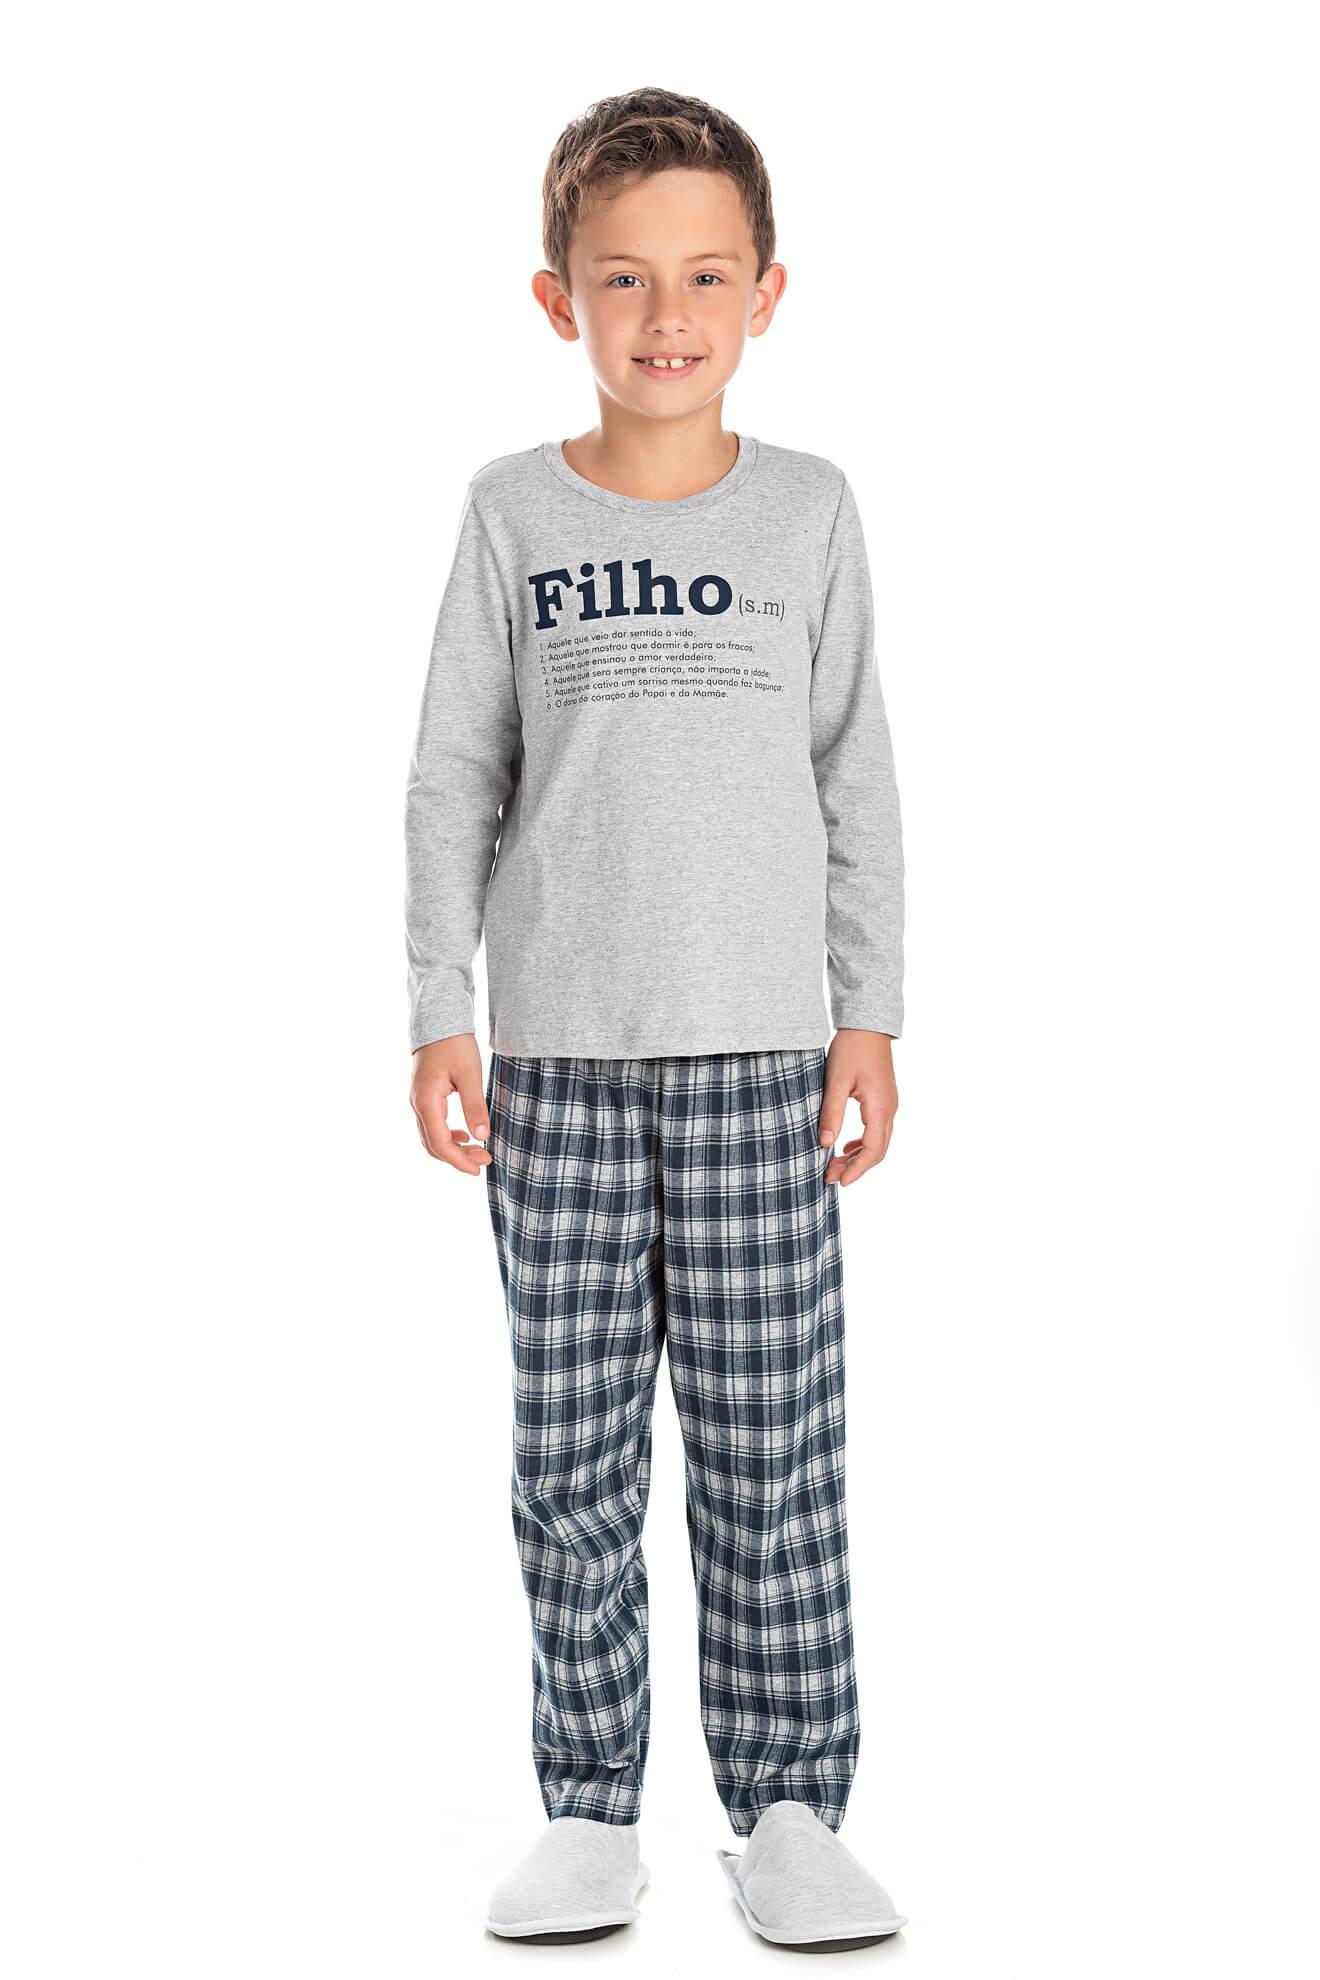 004/C - Pijama Infantil Masculino Xadrez Família Completa